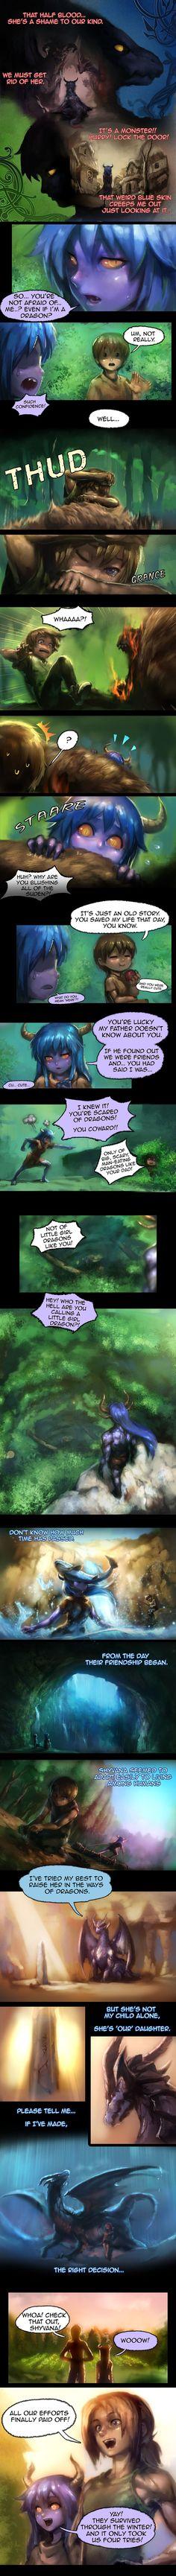 Shyvana~ The Half Dragon Tale. Page 3/6 by ptcrow.deviantart.com on @DeviantArt